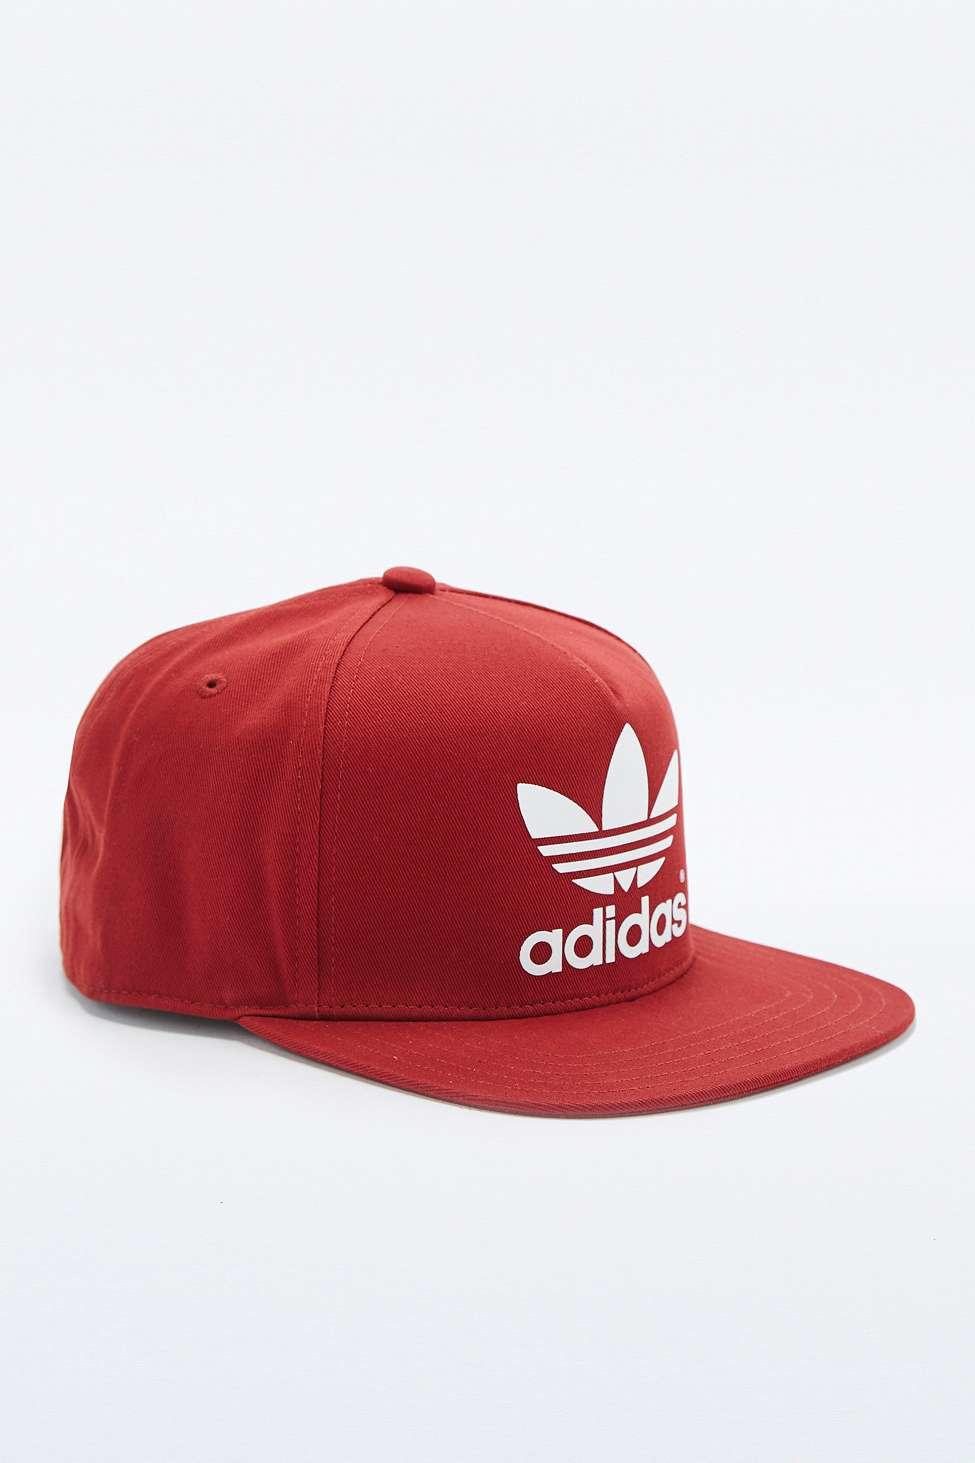 adidas Trefoil Burgundy Snapback Cap in Red for Men - Lyst 3b16ac66ba6